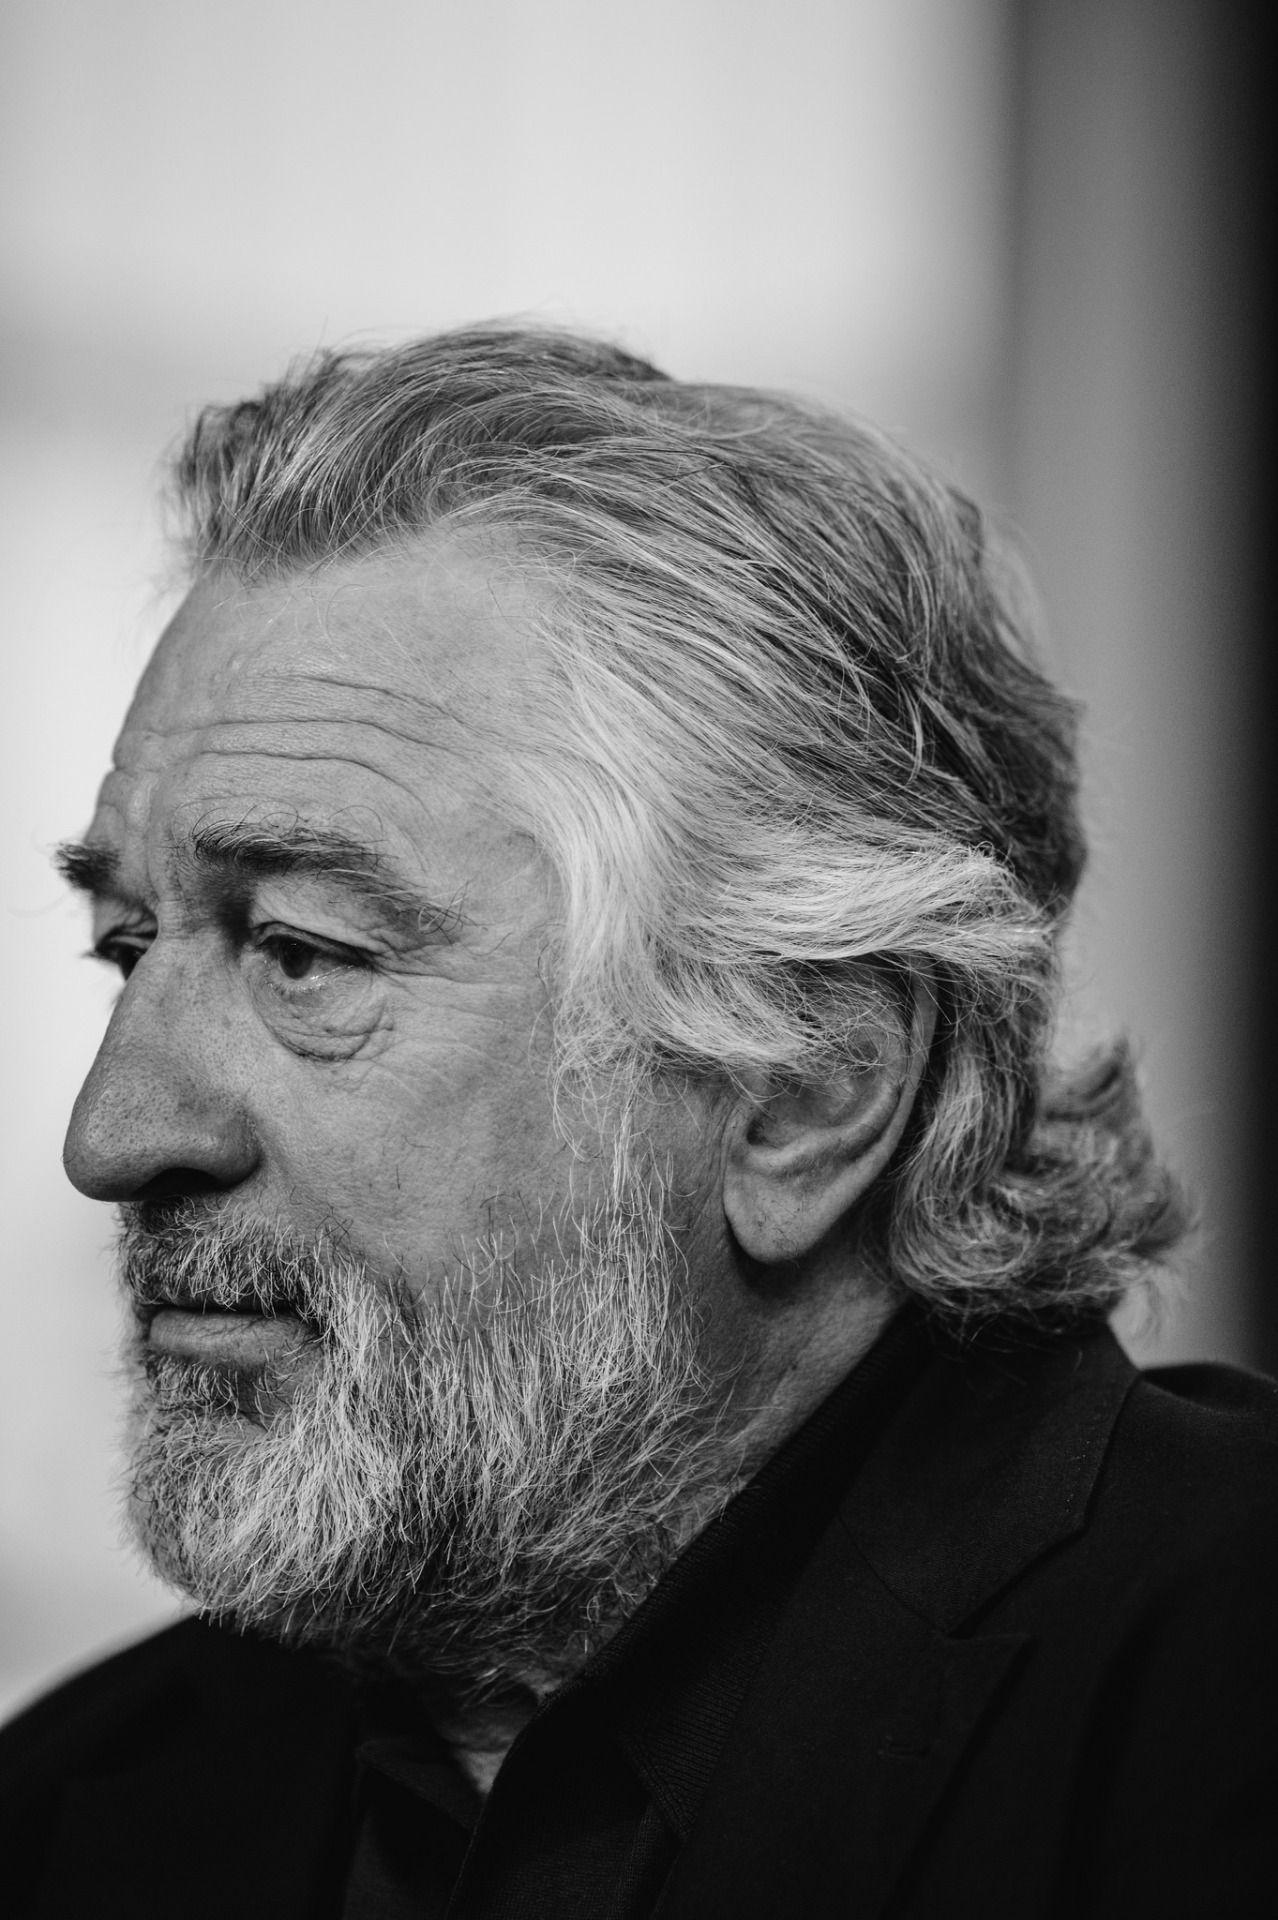 Oscar100world De Niro Portrait Celebrity Portraits Robert De Niro